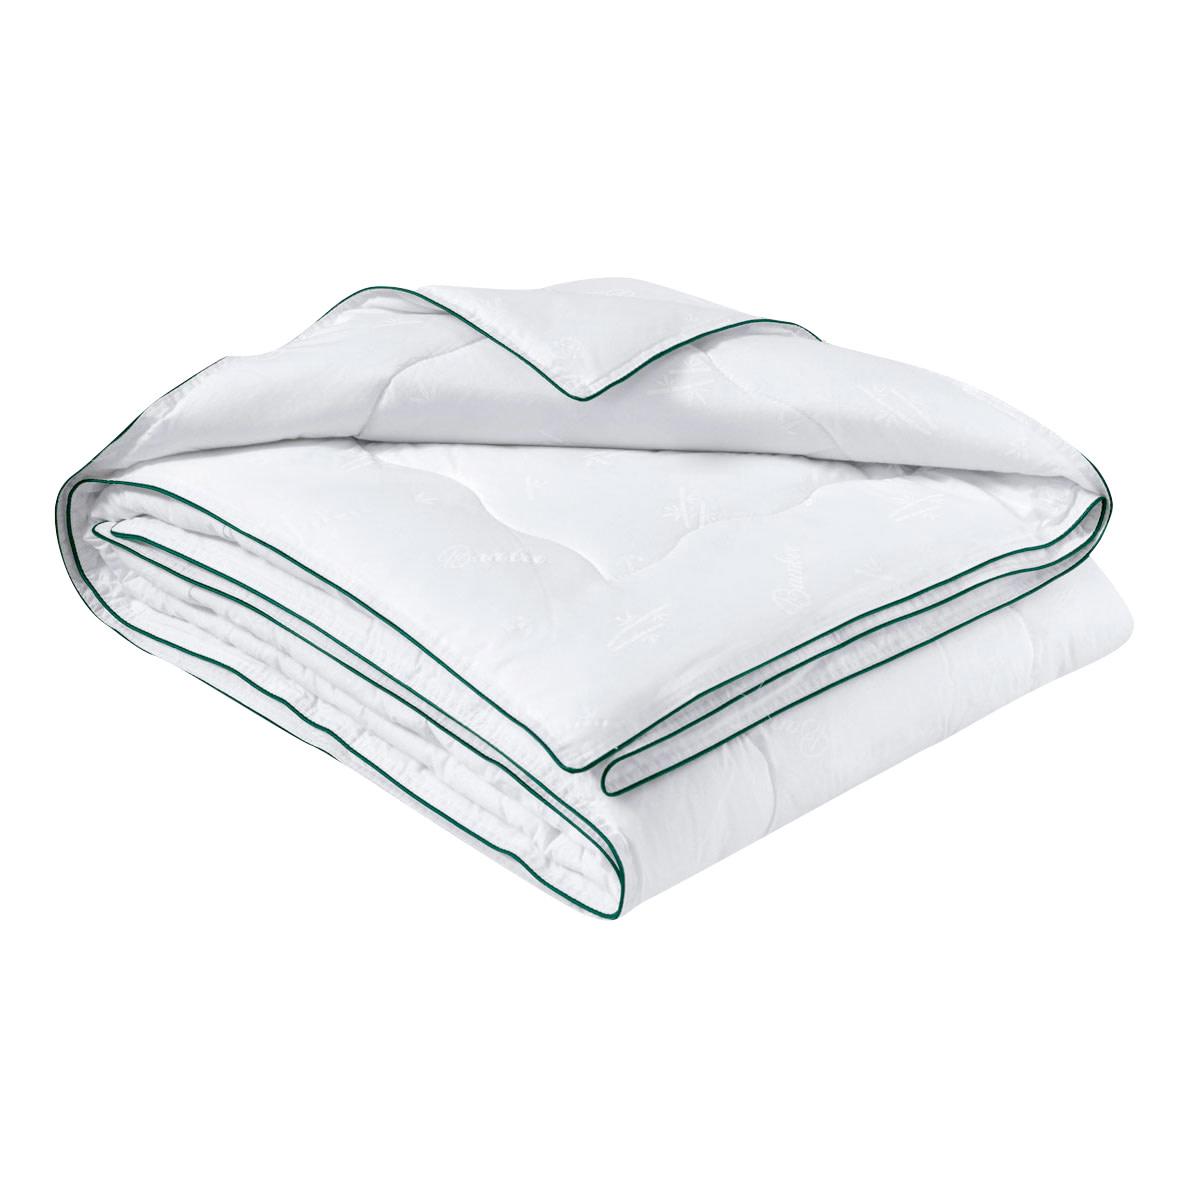 Одеяло Arya home collection 215х195 см бамбук нано волокно